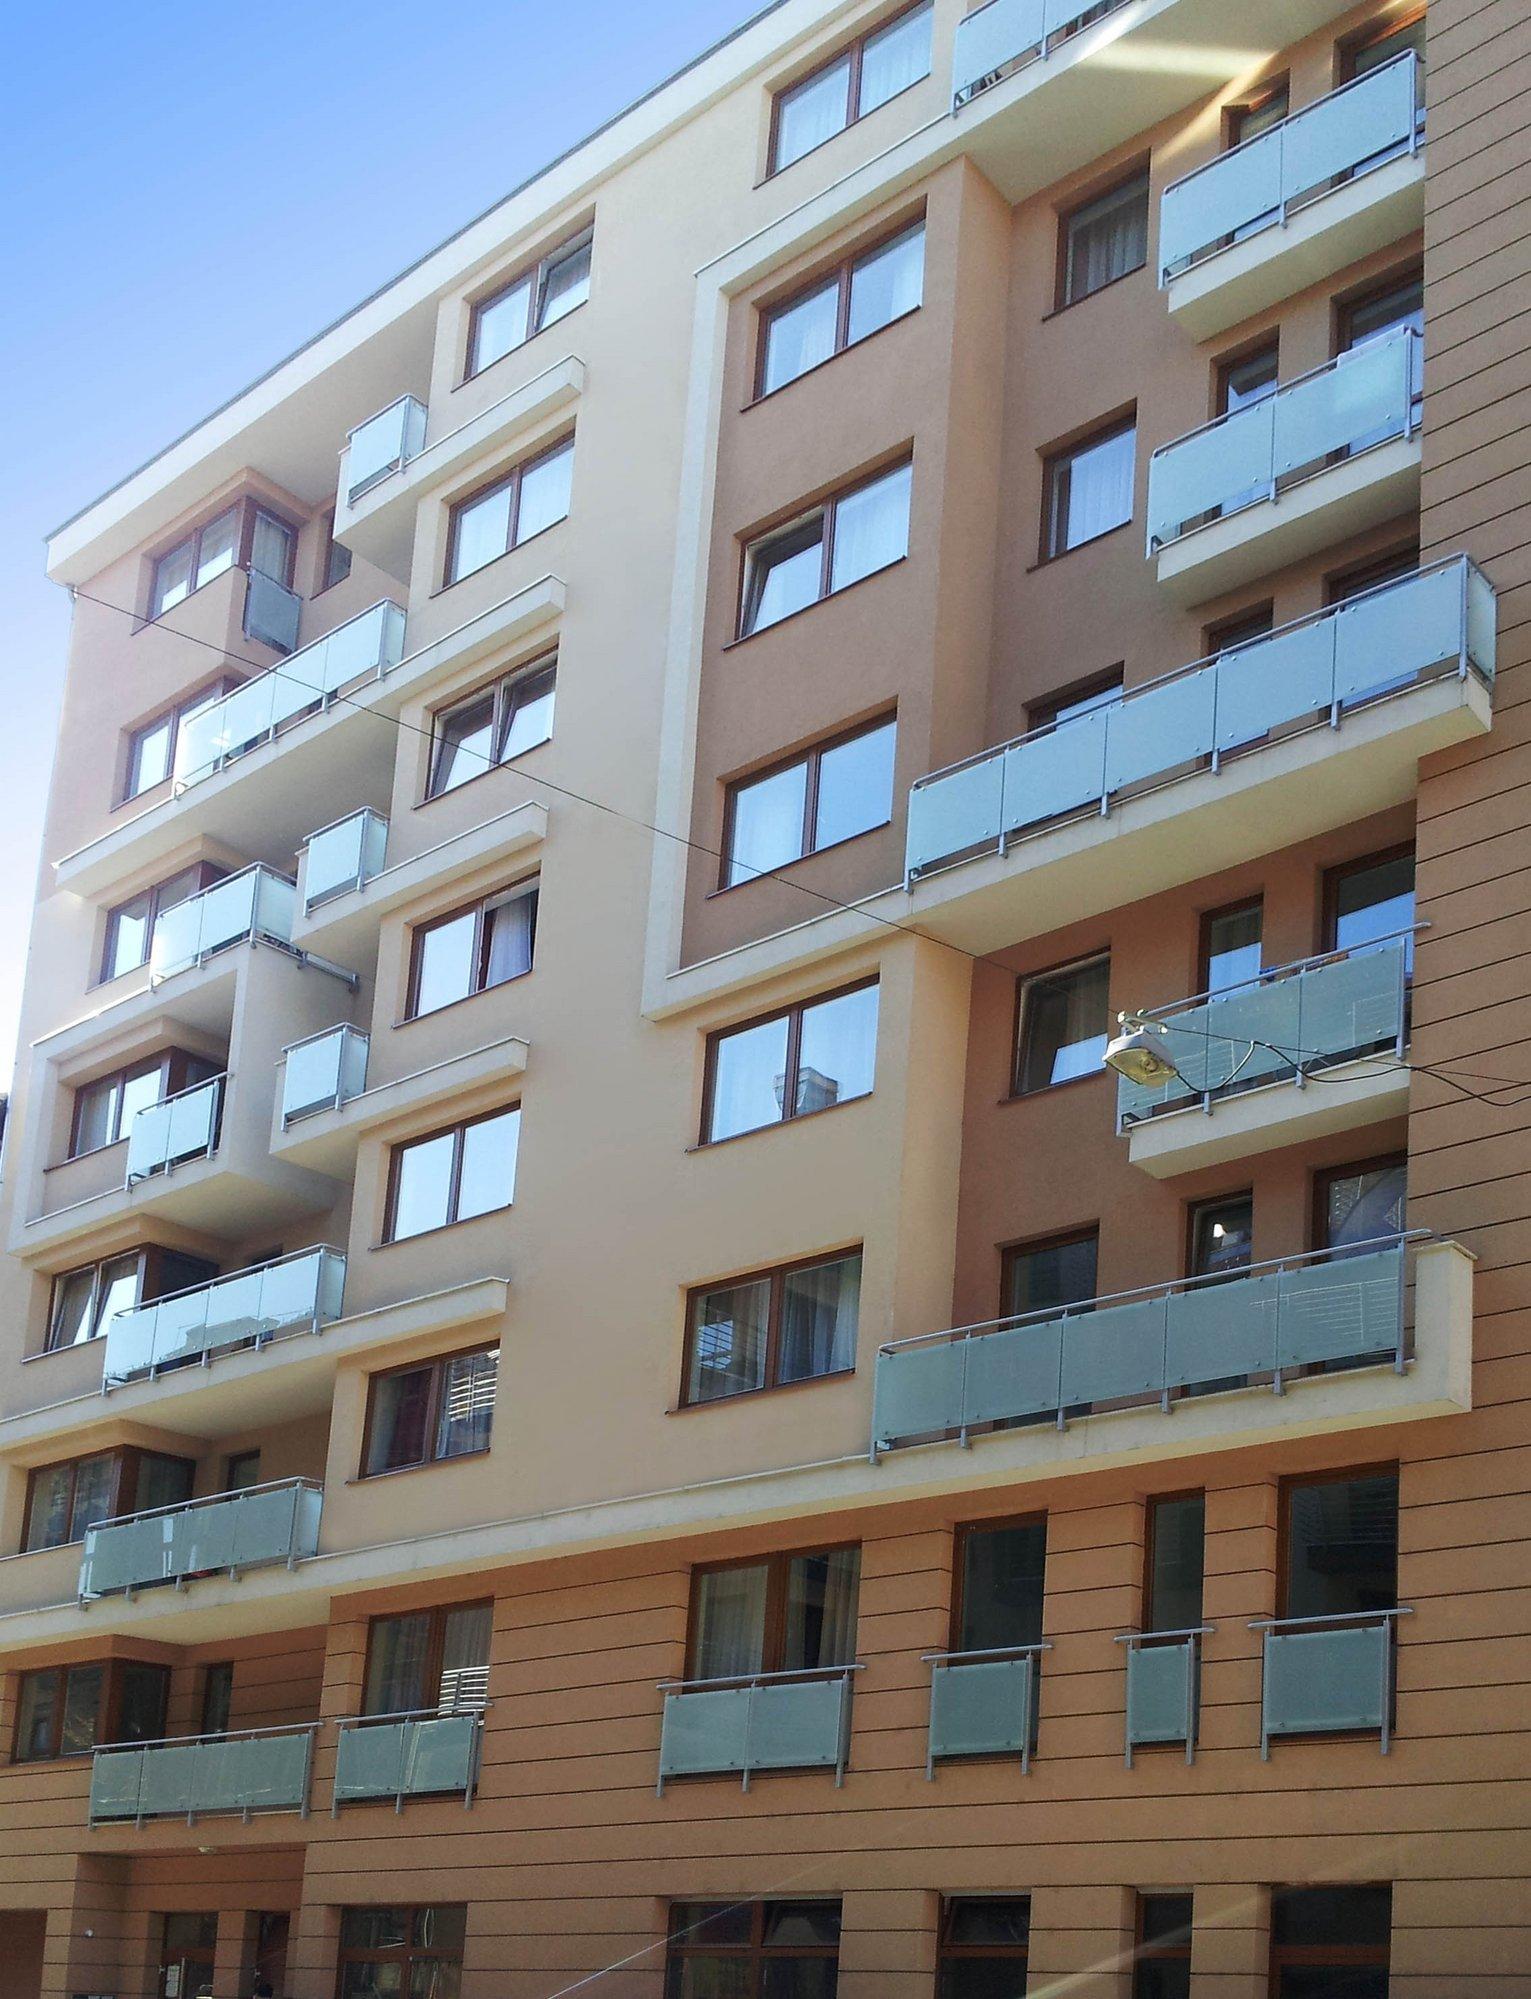 La firma bilbaína Kategora proyecta adquirir su tercer edificio residencial en Budapest